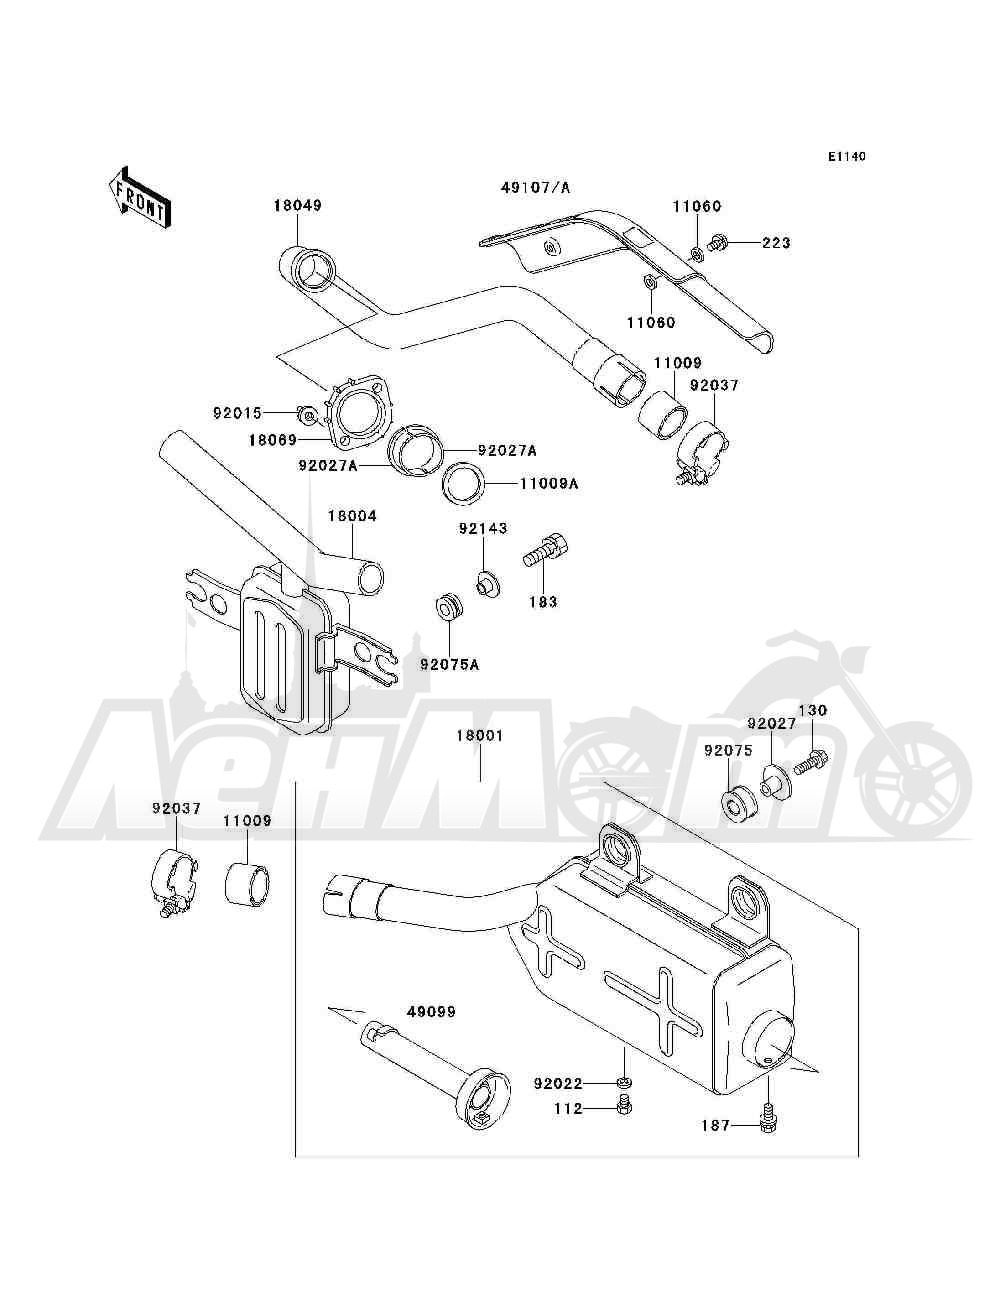 Запчасти для Квадроцикла Kawasaki 1994 BAYOU 300 4X4 (KLF300-C6) Раздел: MUFFLER(S) | глушитель (S)